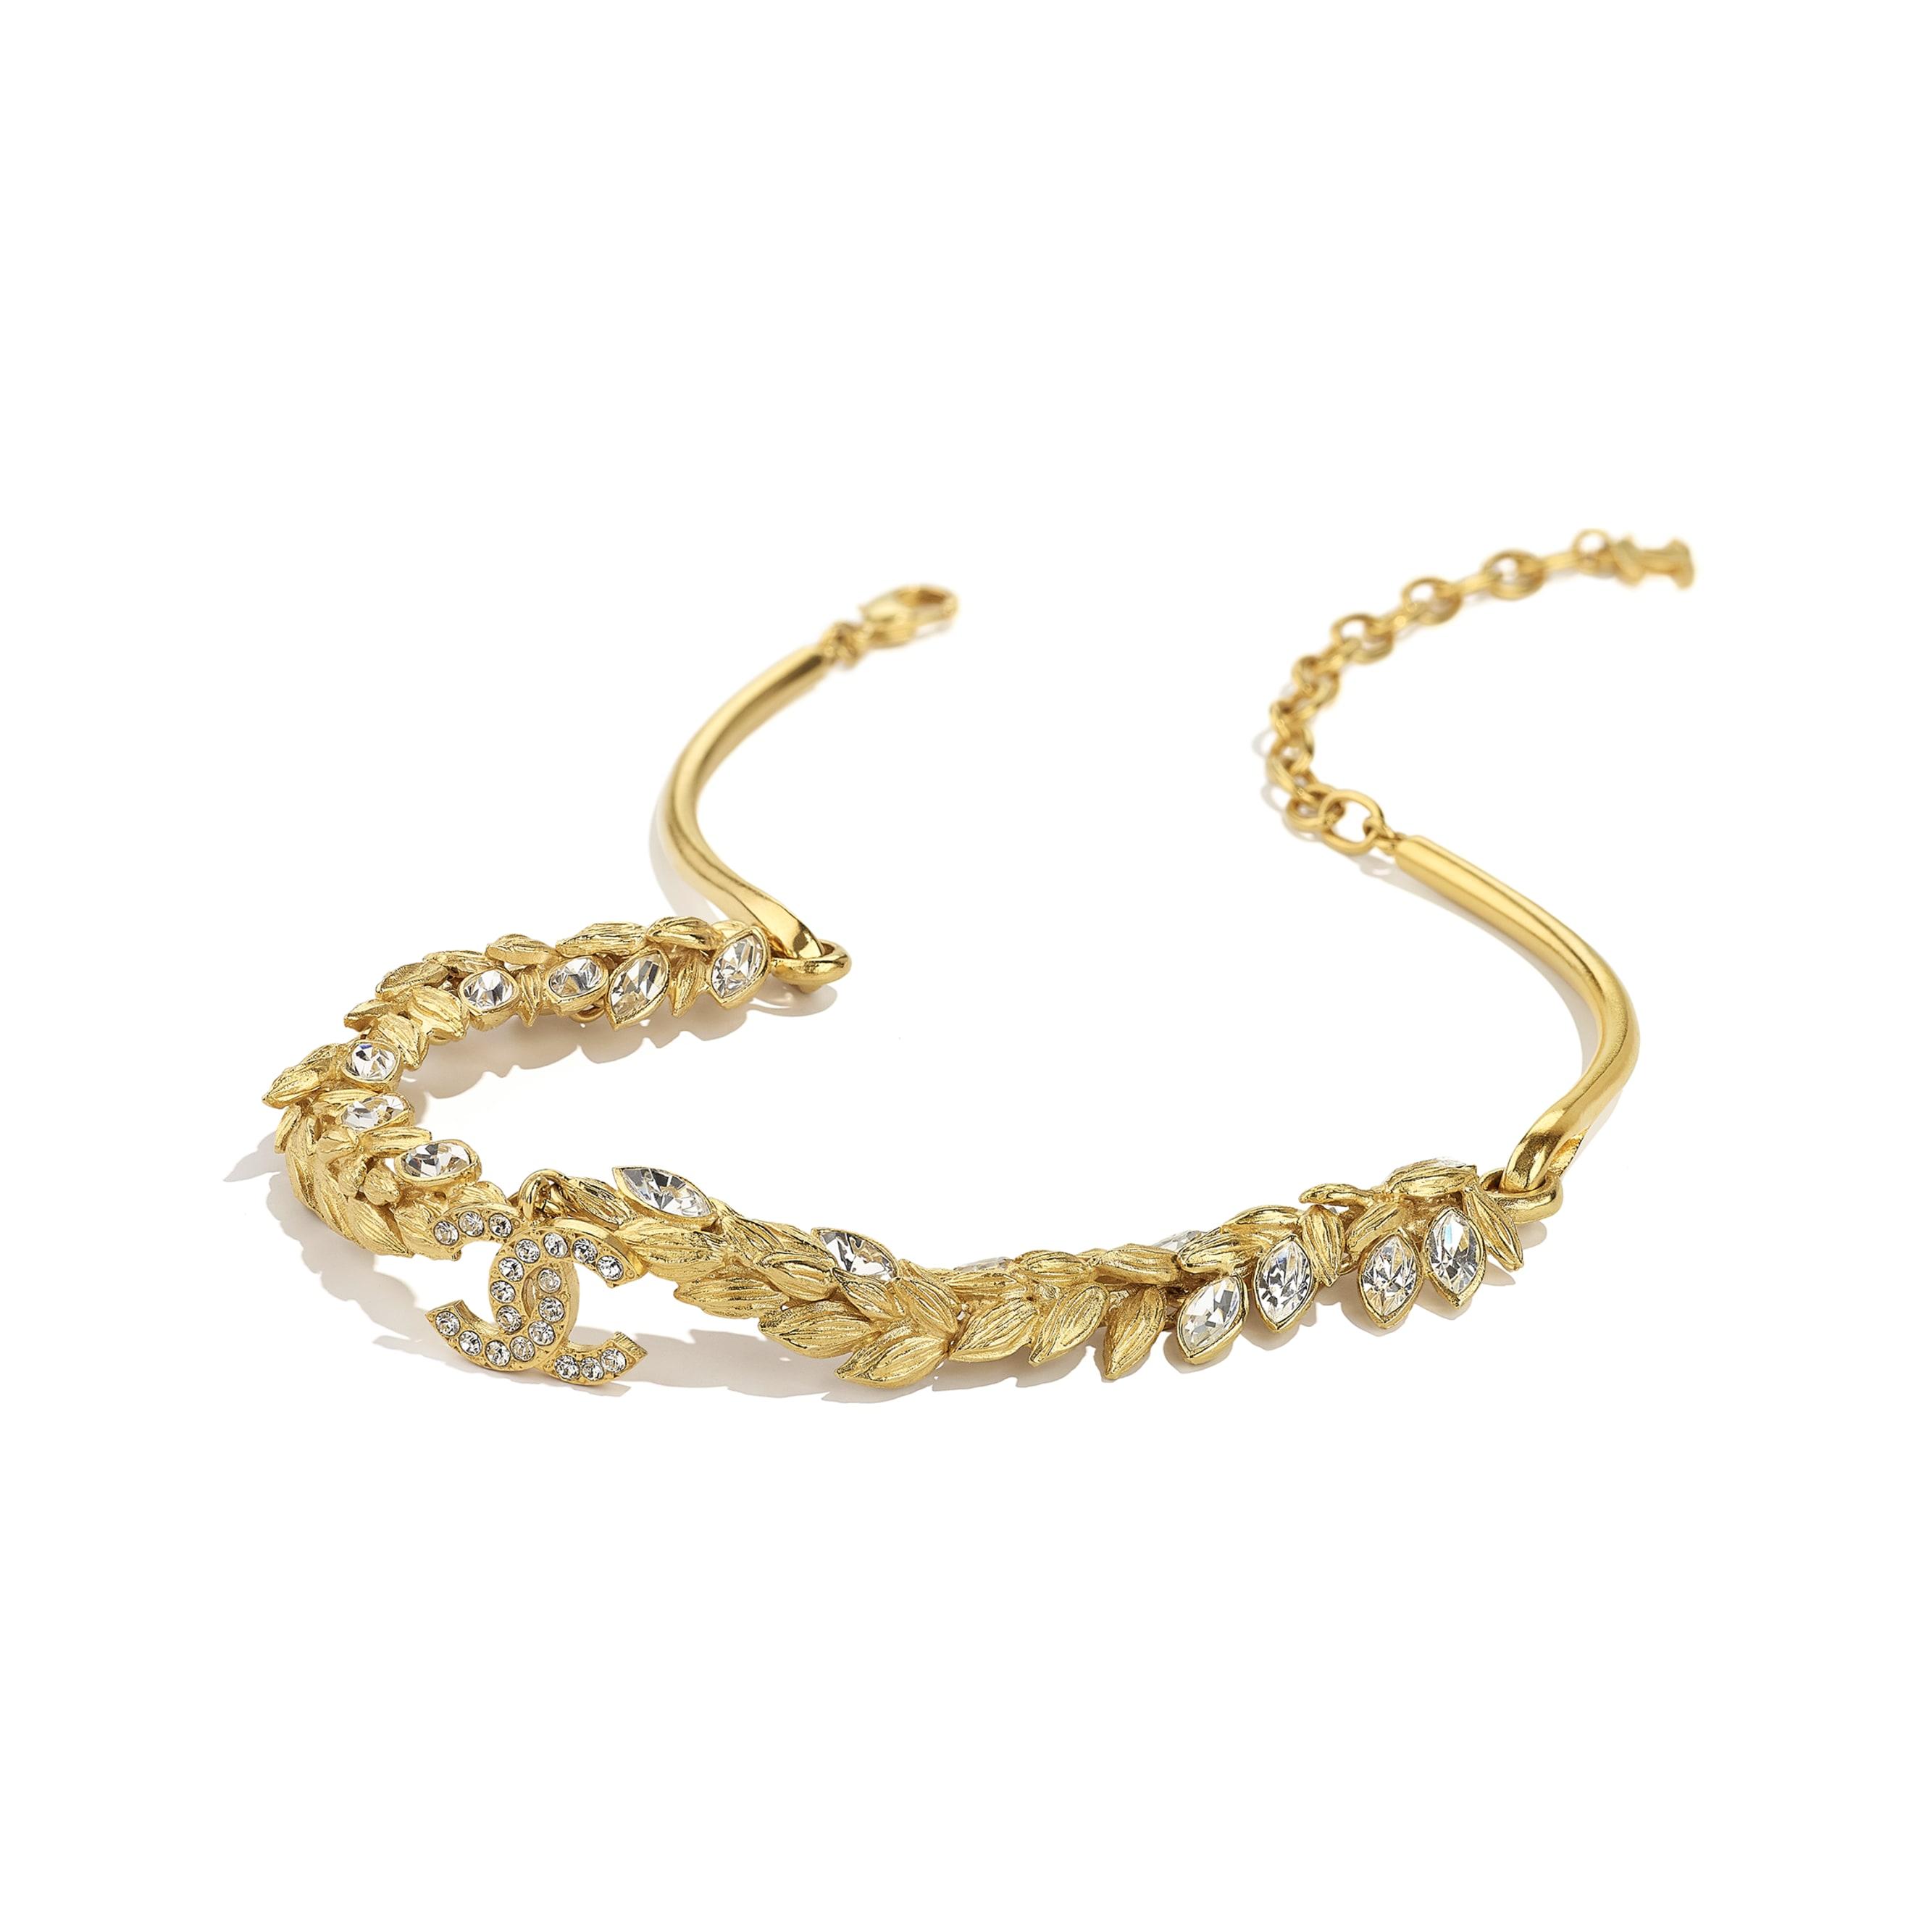 Gargantilha - Gold & Crystal - Metal & Strass - CHANEL - Vista alternativa - ver a versão em tamanho standard